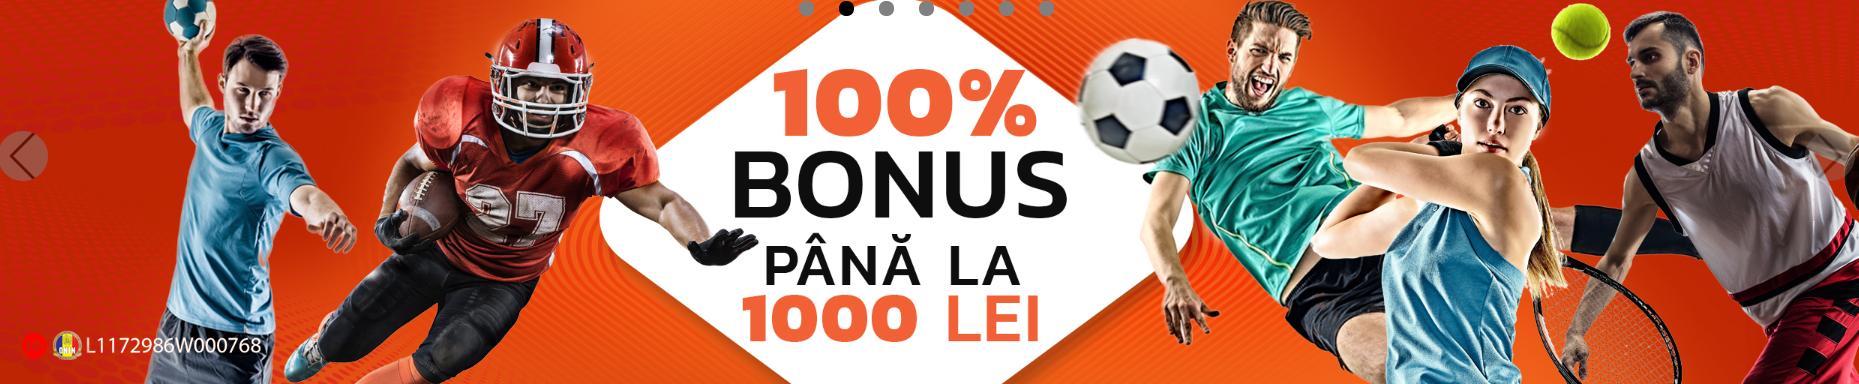 bonus publicwin 100% pana la 1000 RON